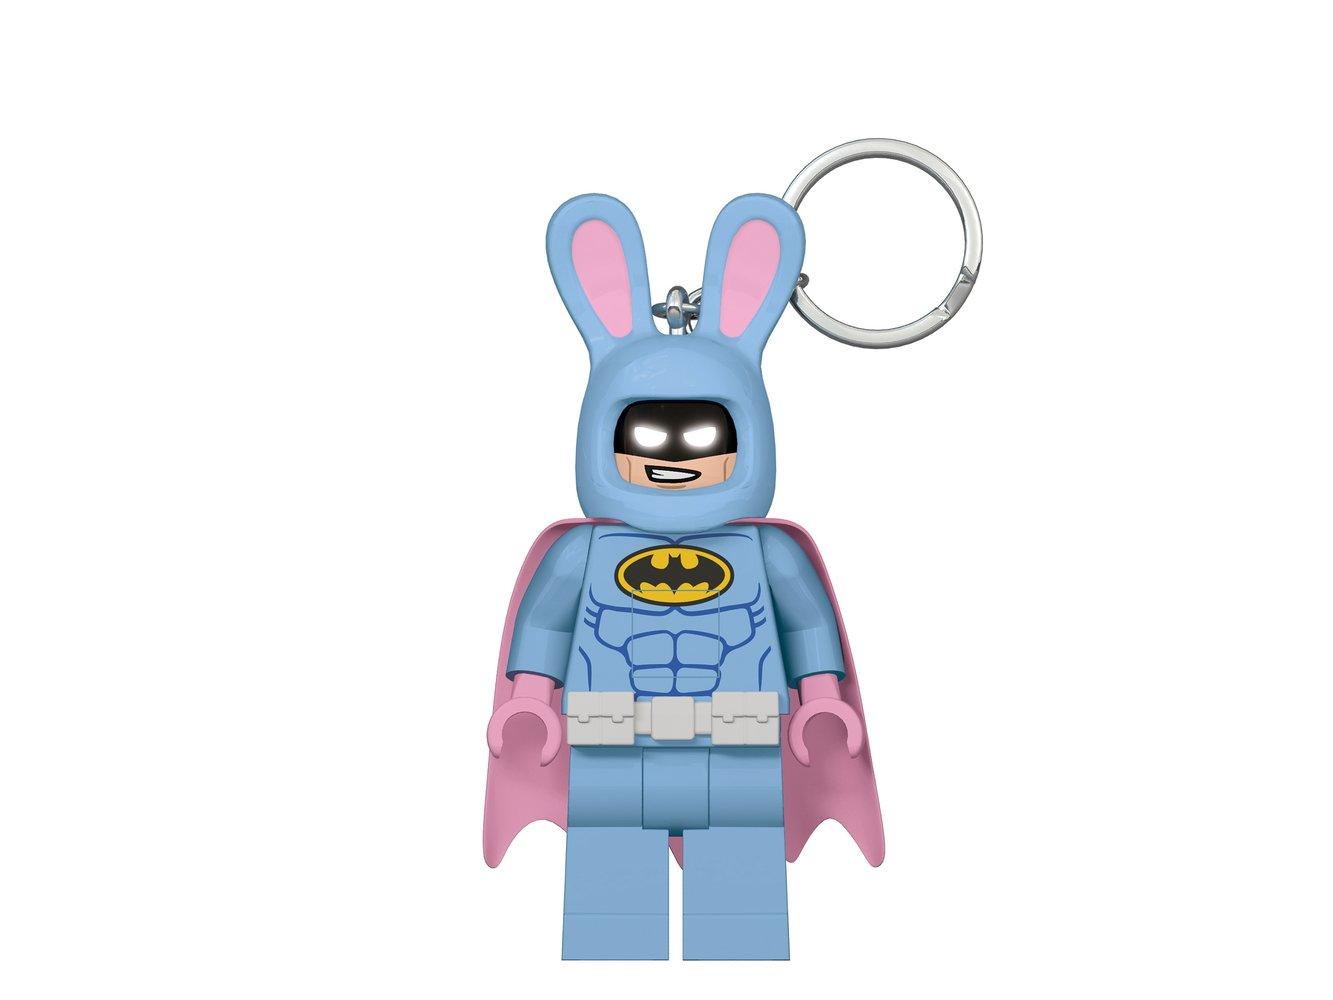 Easter Bunny Batman Minifigure Key Light